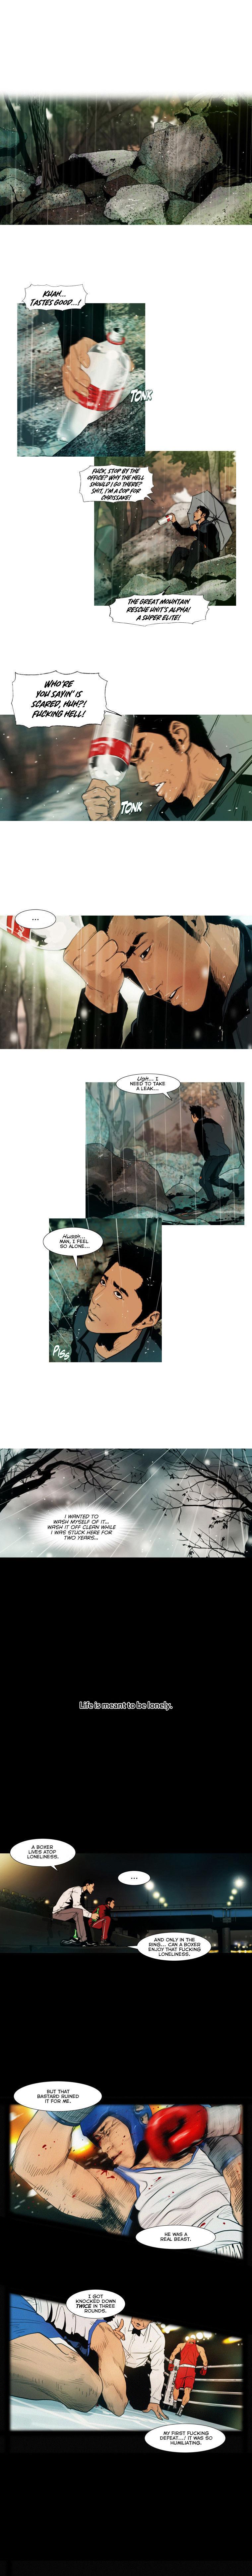 Peak (Im Gang-hyeok) 75 Page 2